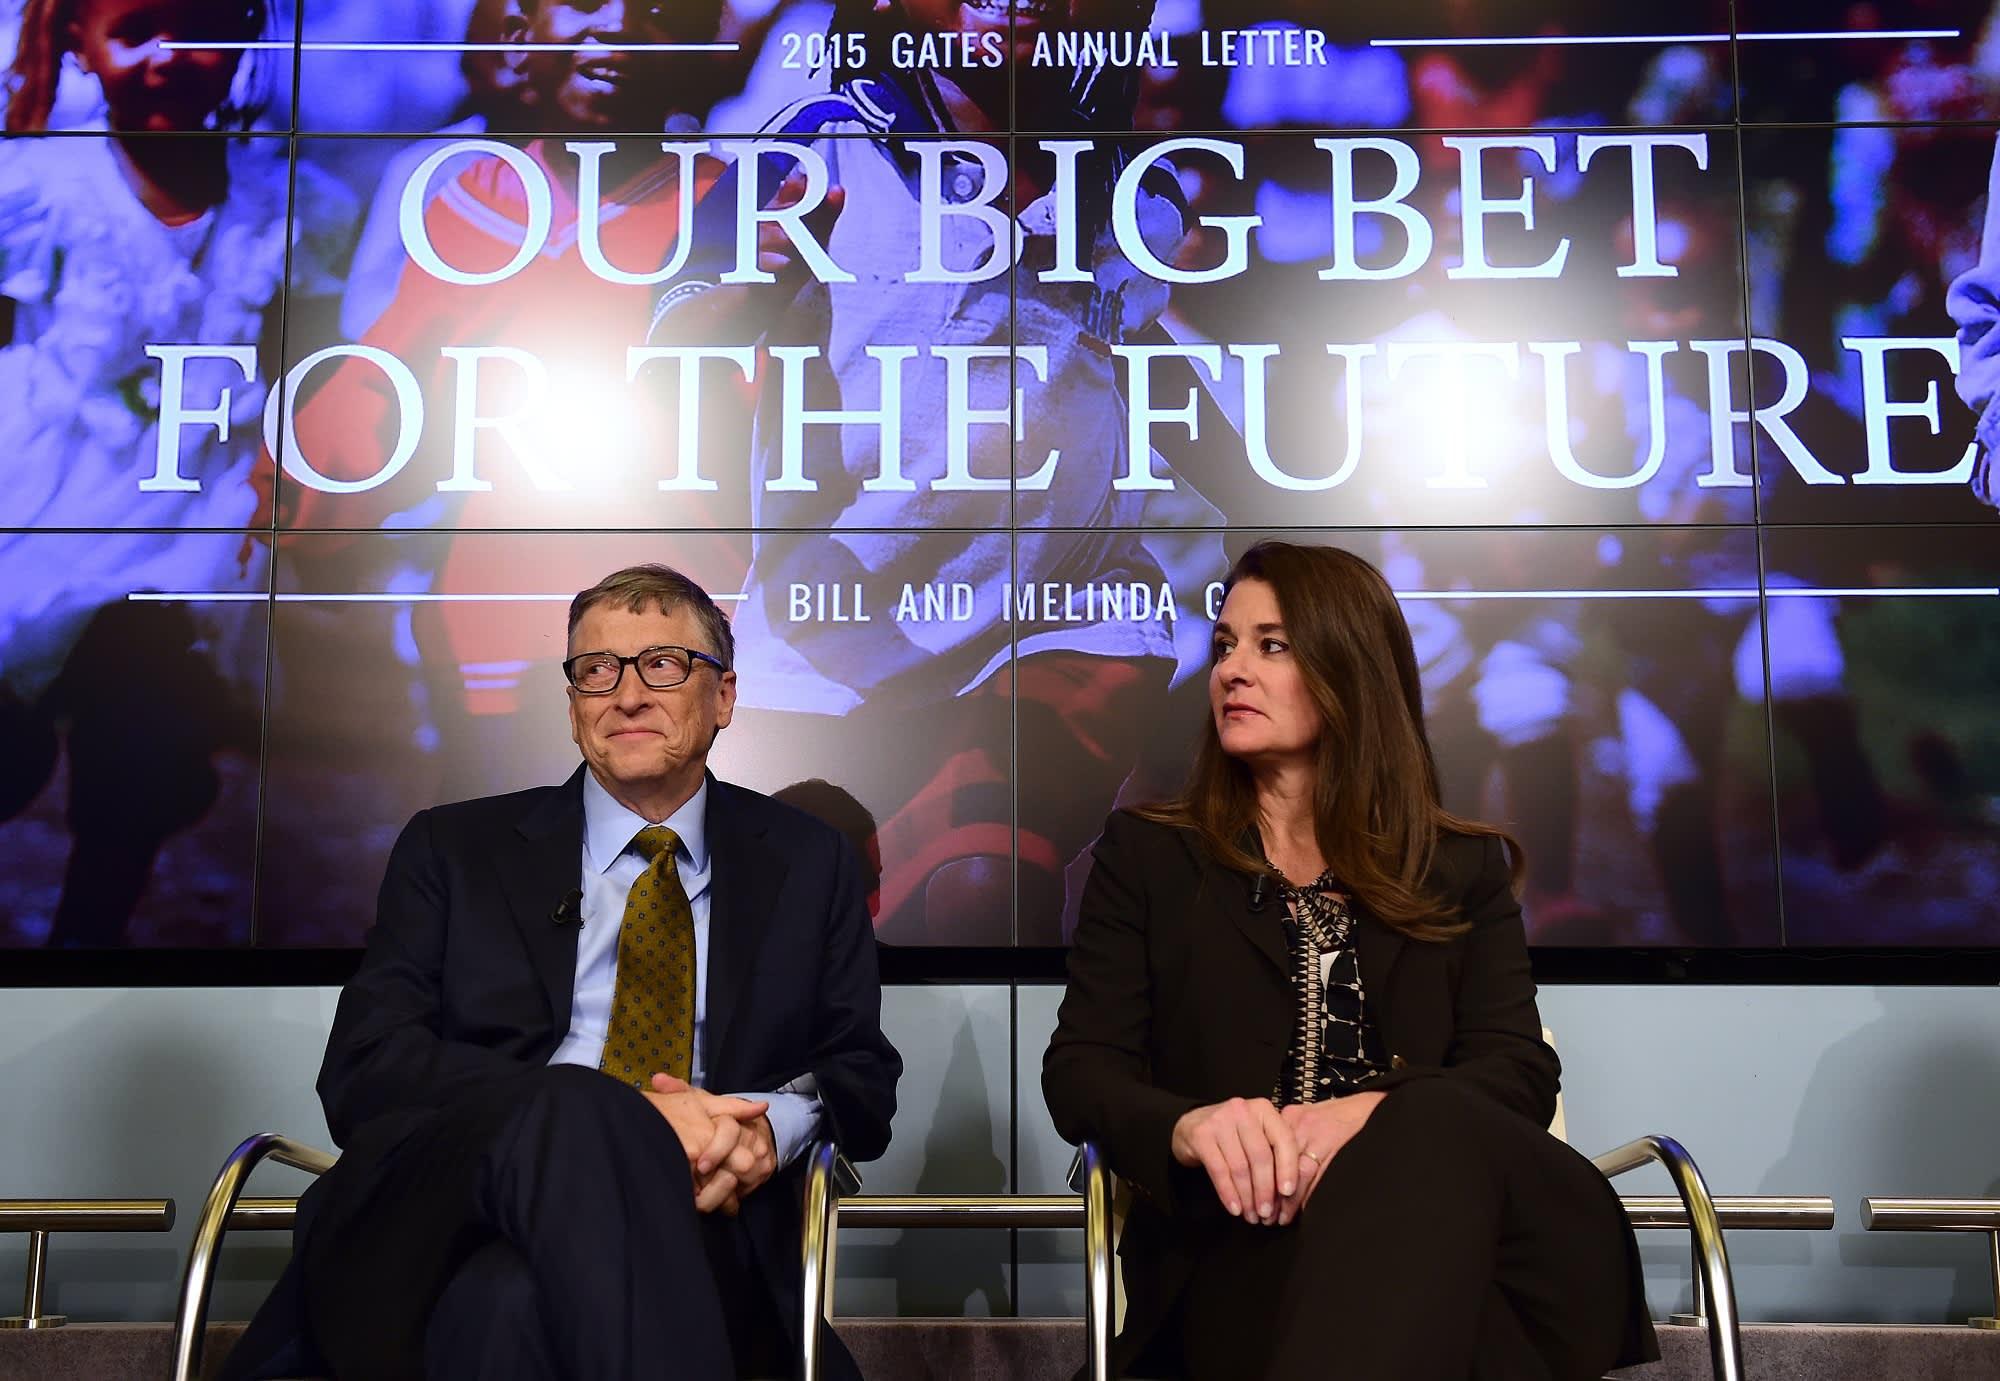 Bill and Melinda Gates have spent billions on US education